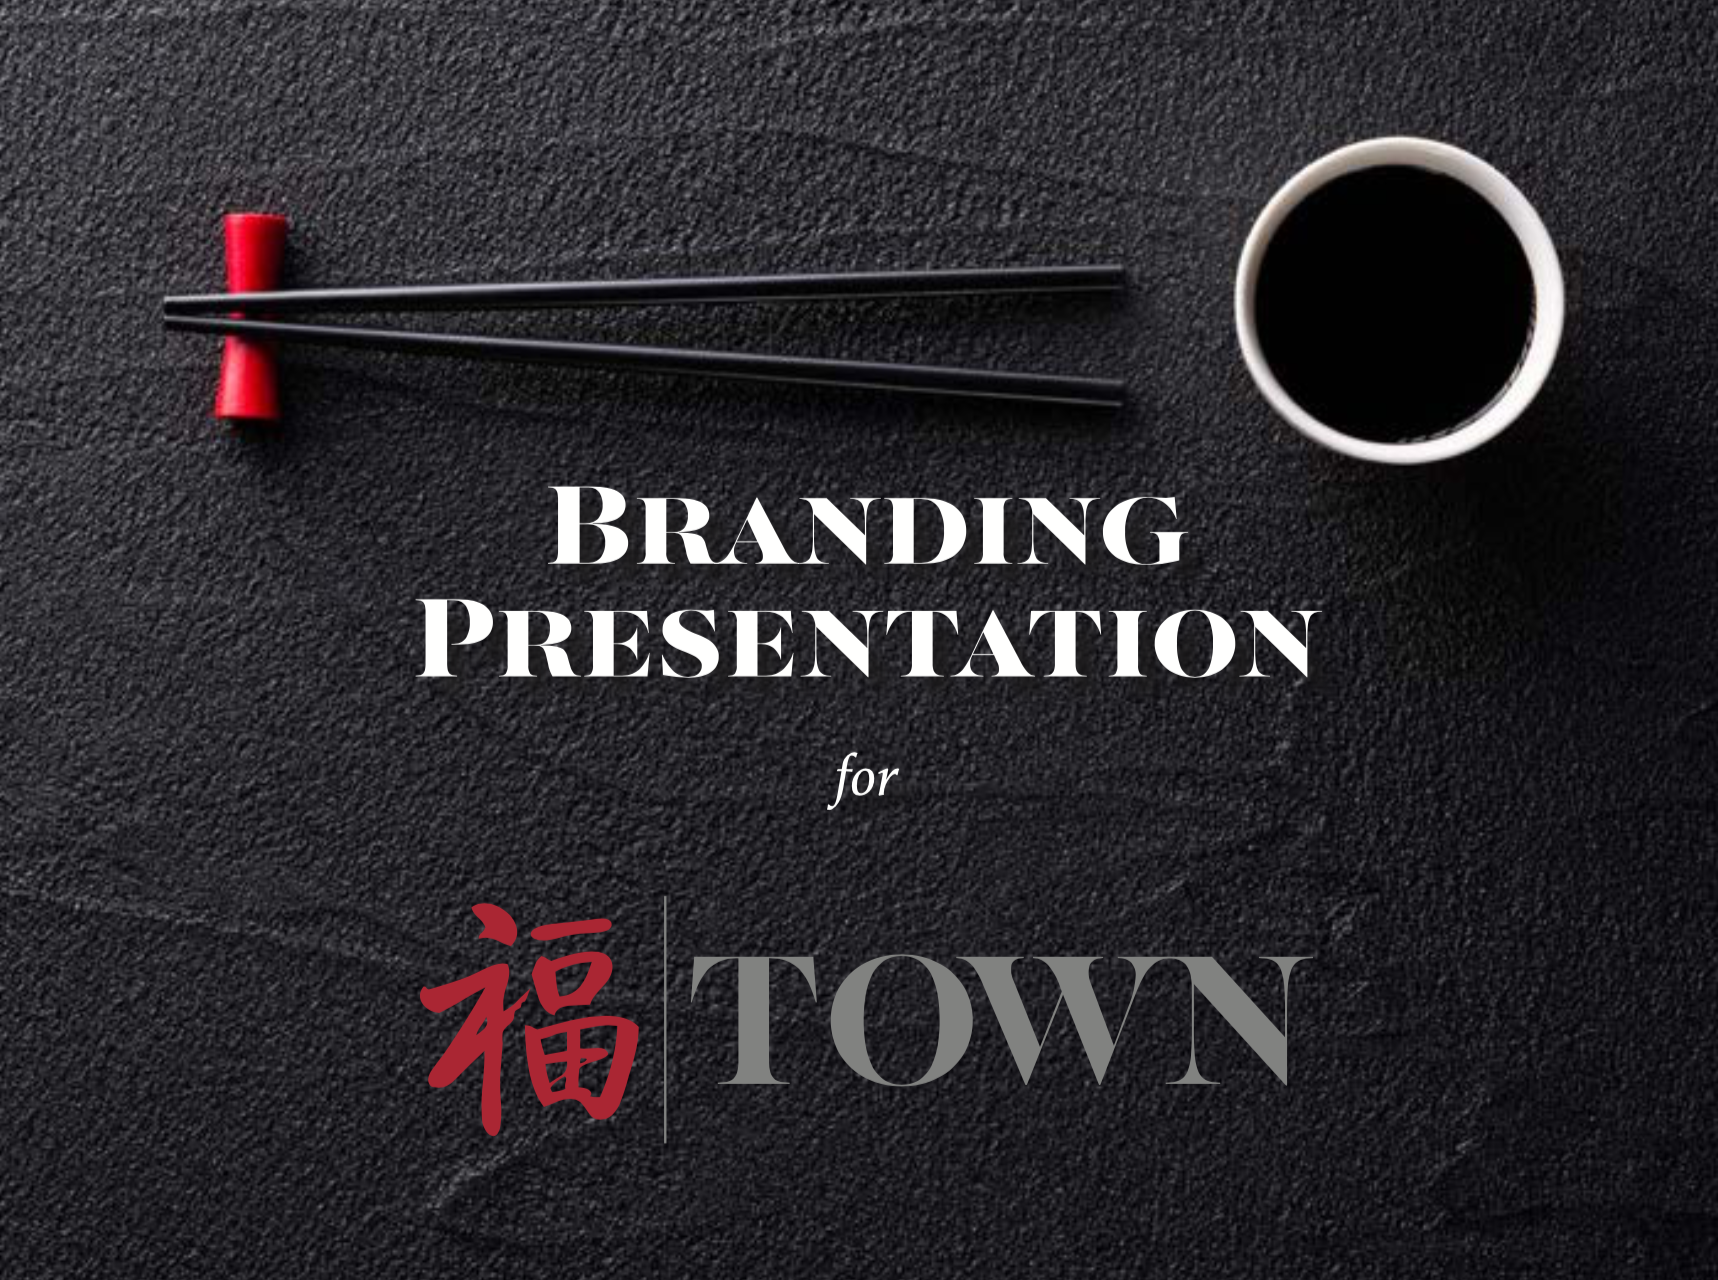 Town Branding Presentation